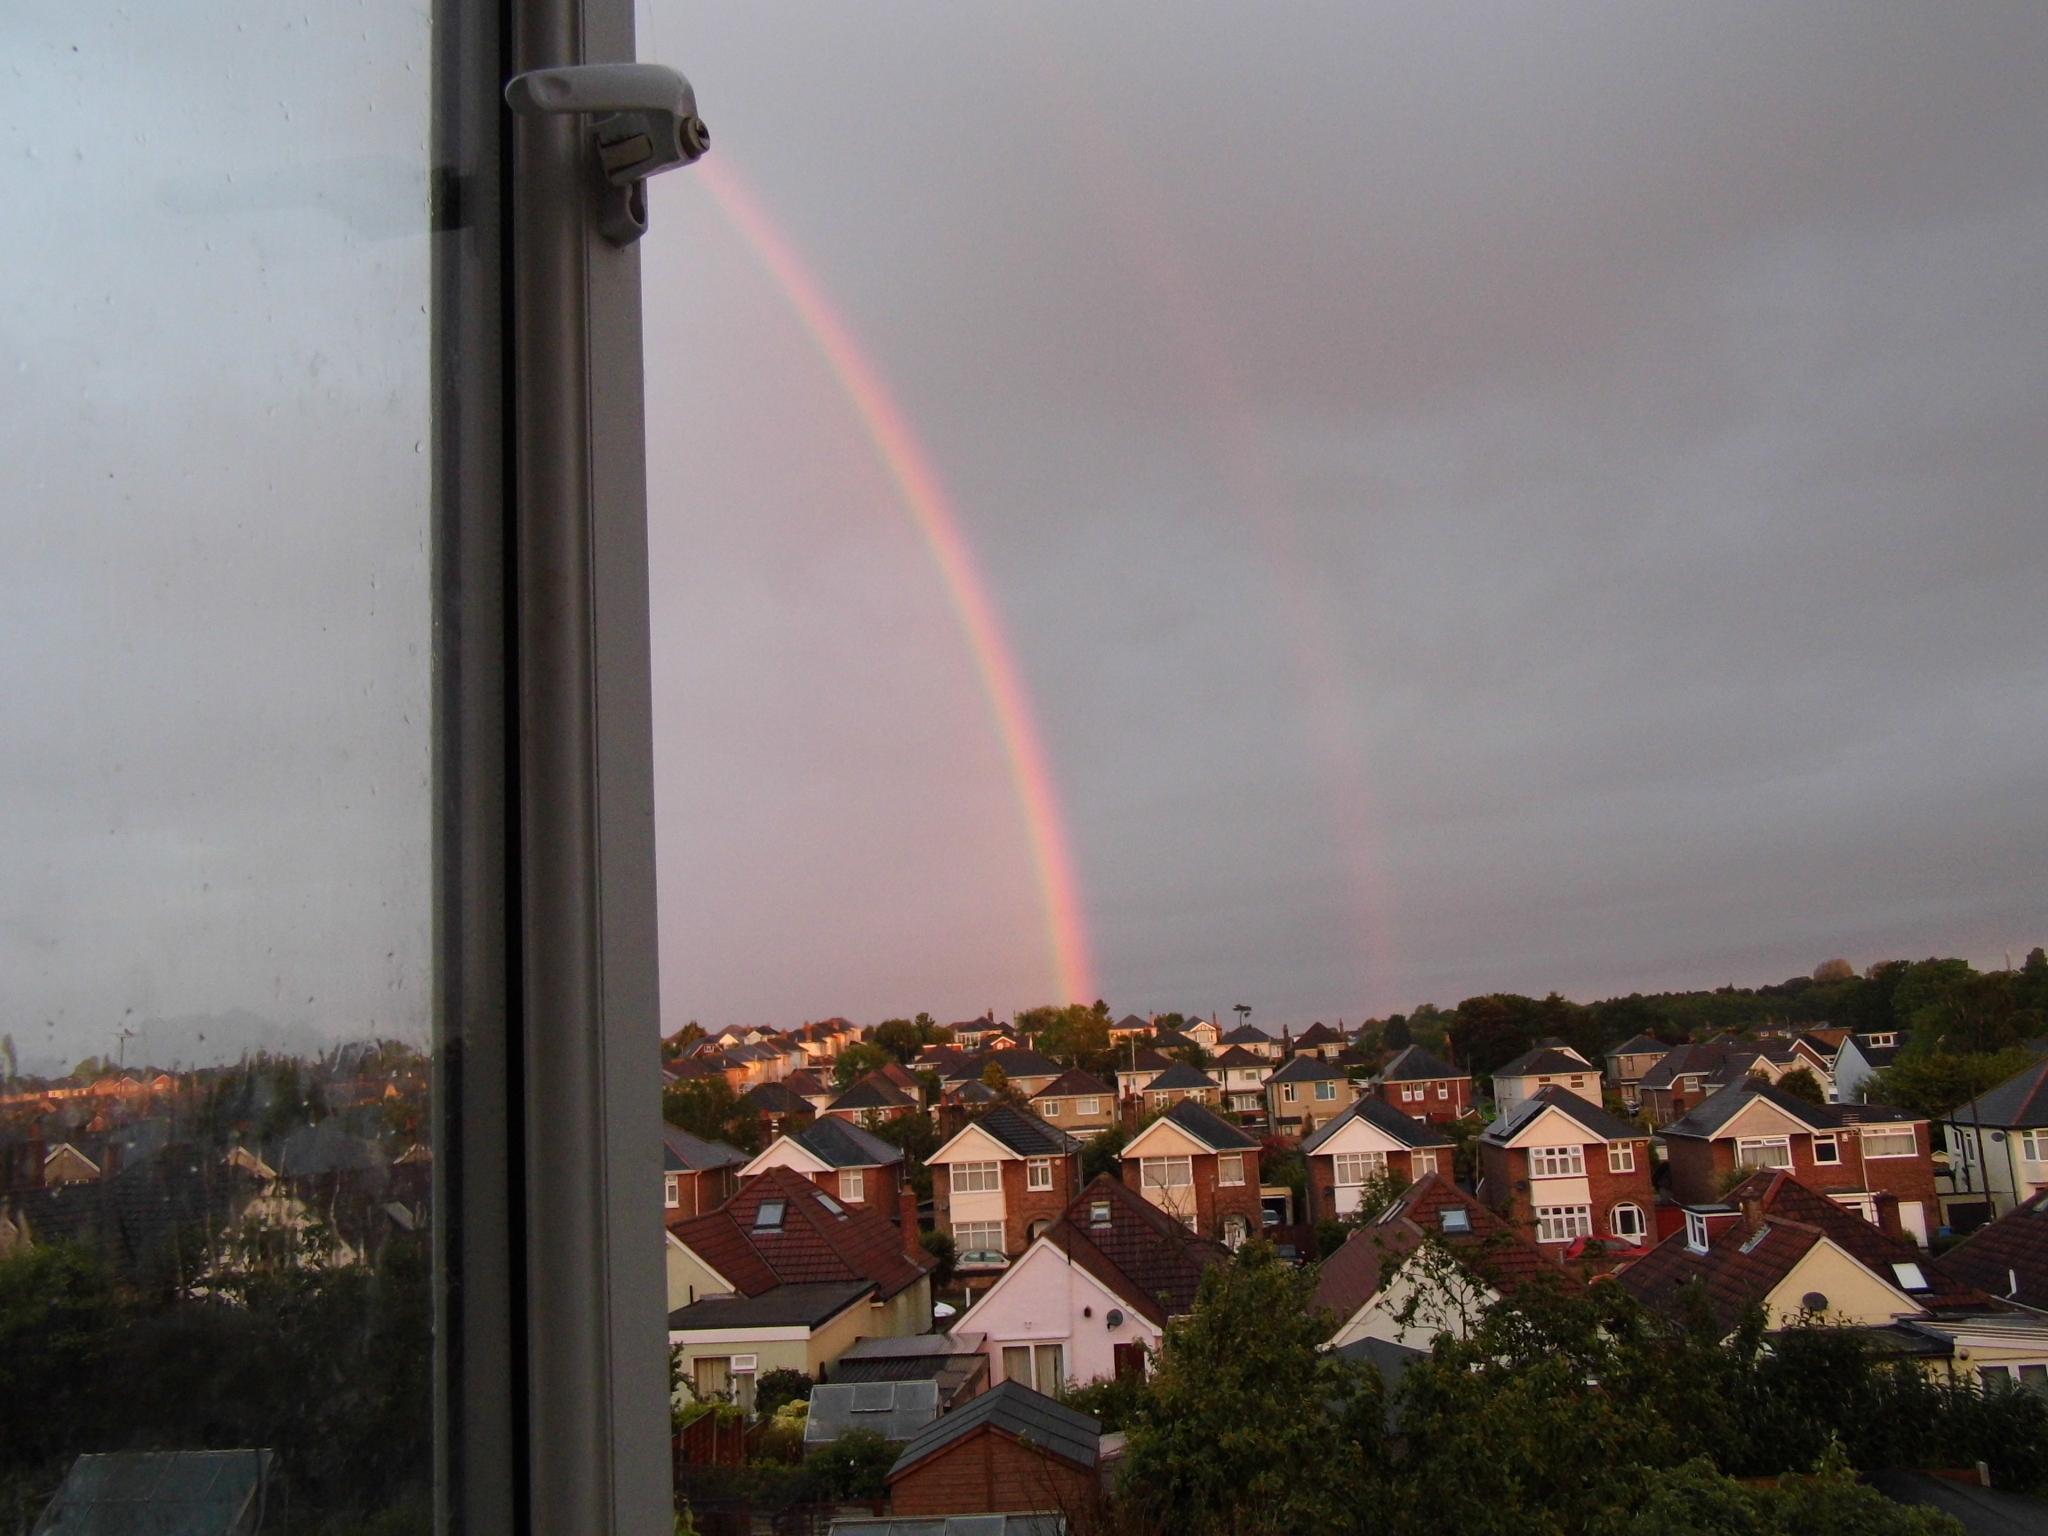 feint double rainbow by Naomi D Tillotson-Keating